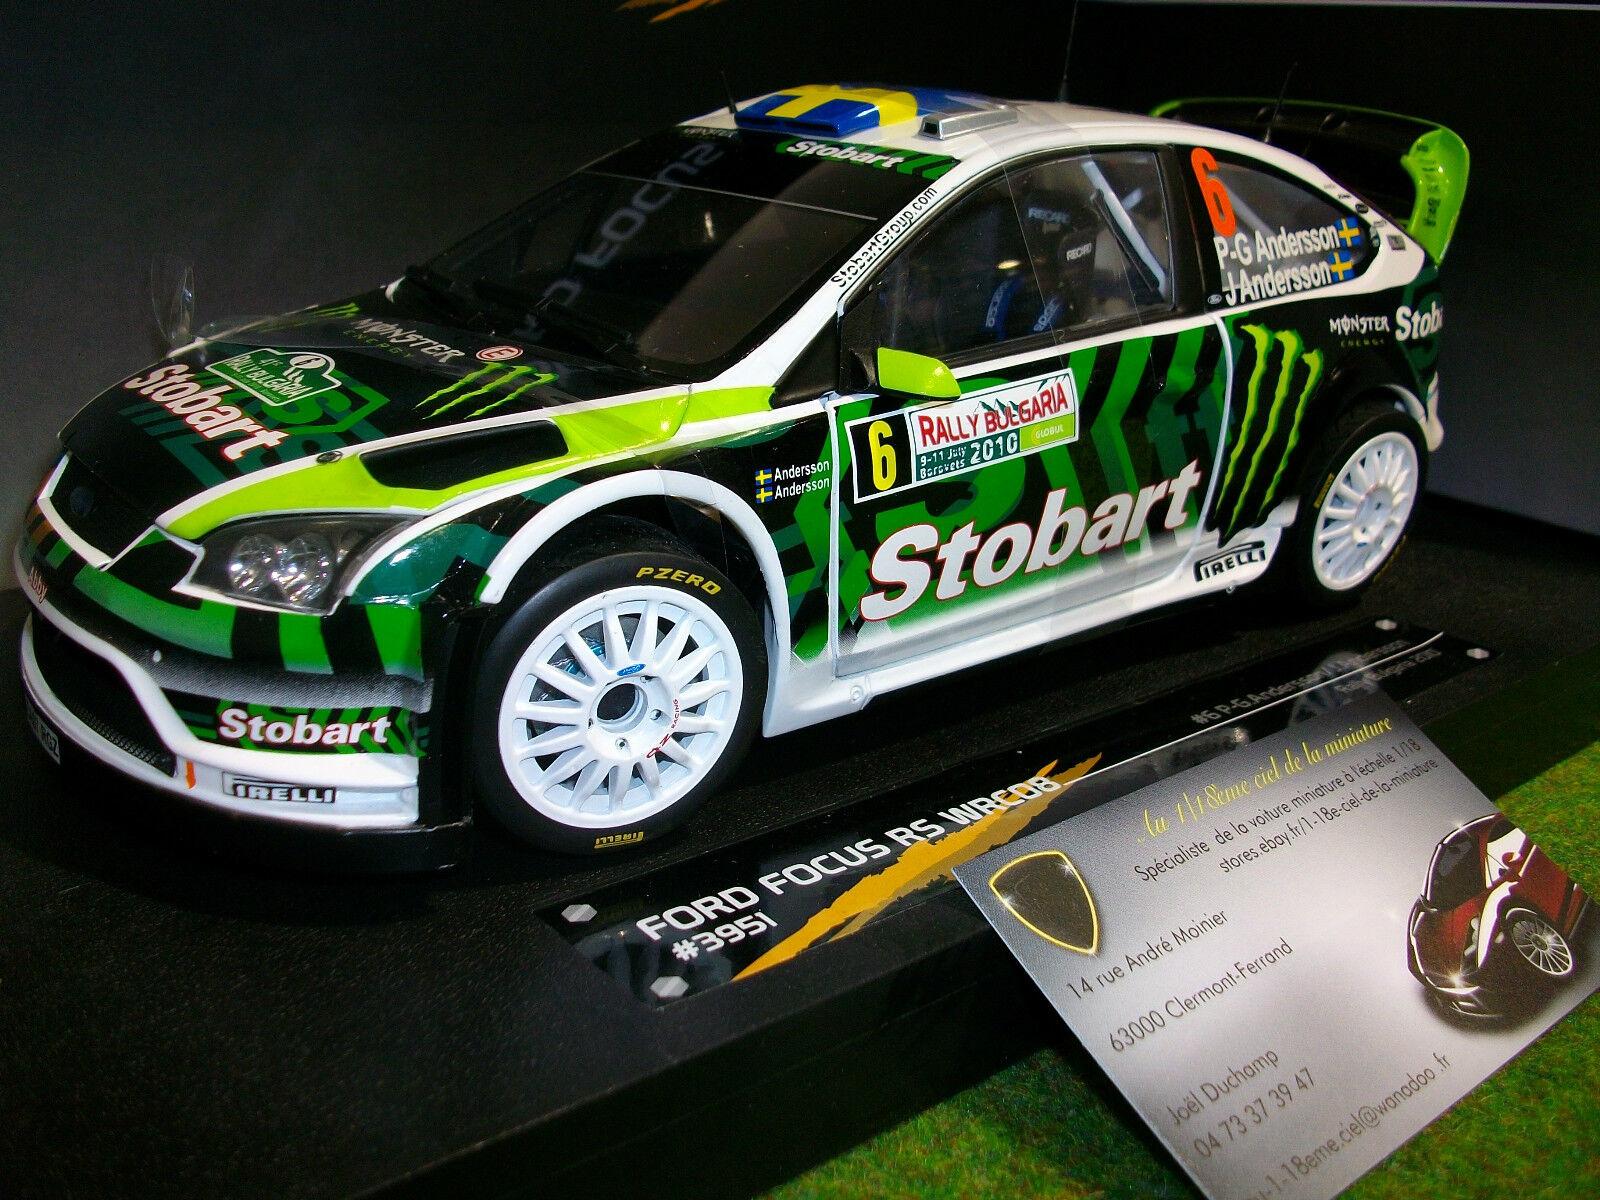 FORD FOCUS RS WRC08 STOBART Rallye BULGARIE 2010 au 1 18 SUNSTAR 3951 voiture